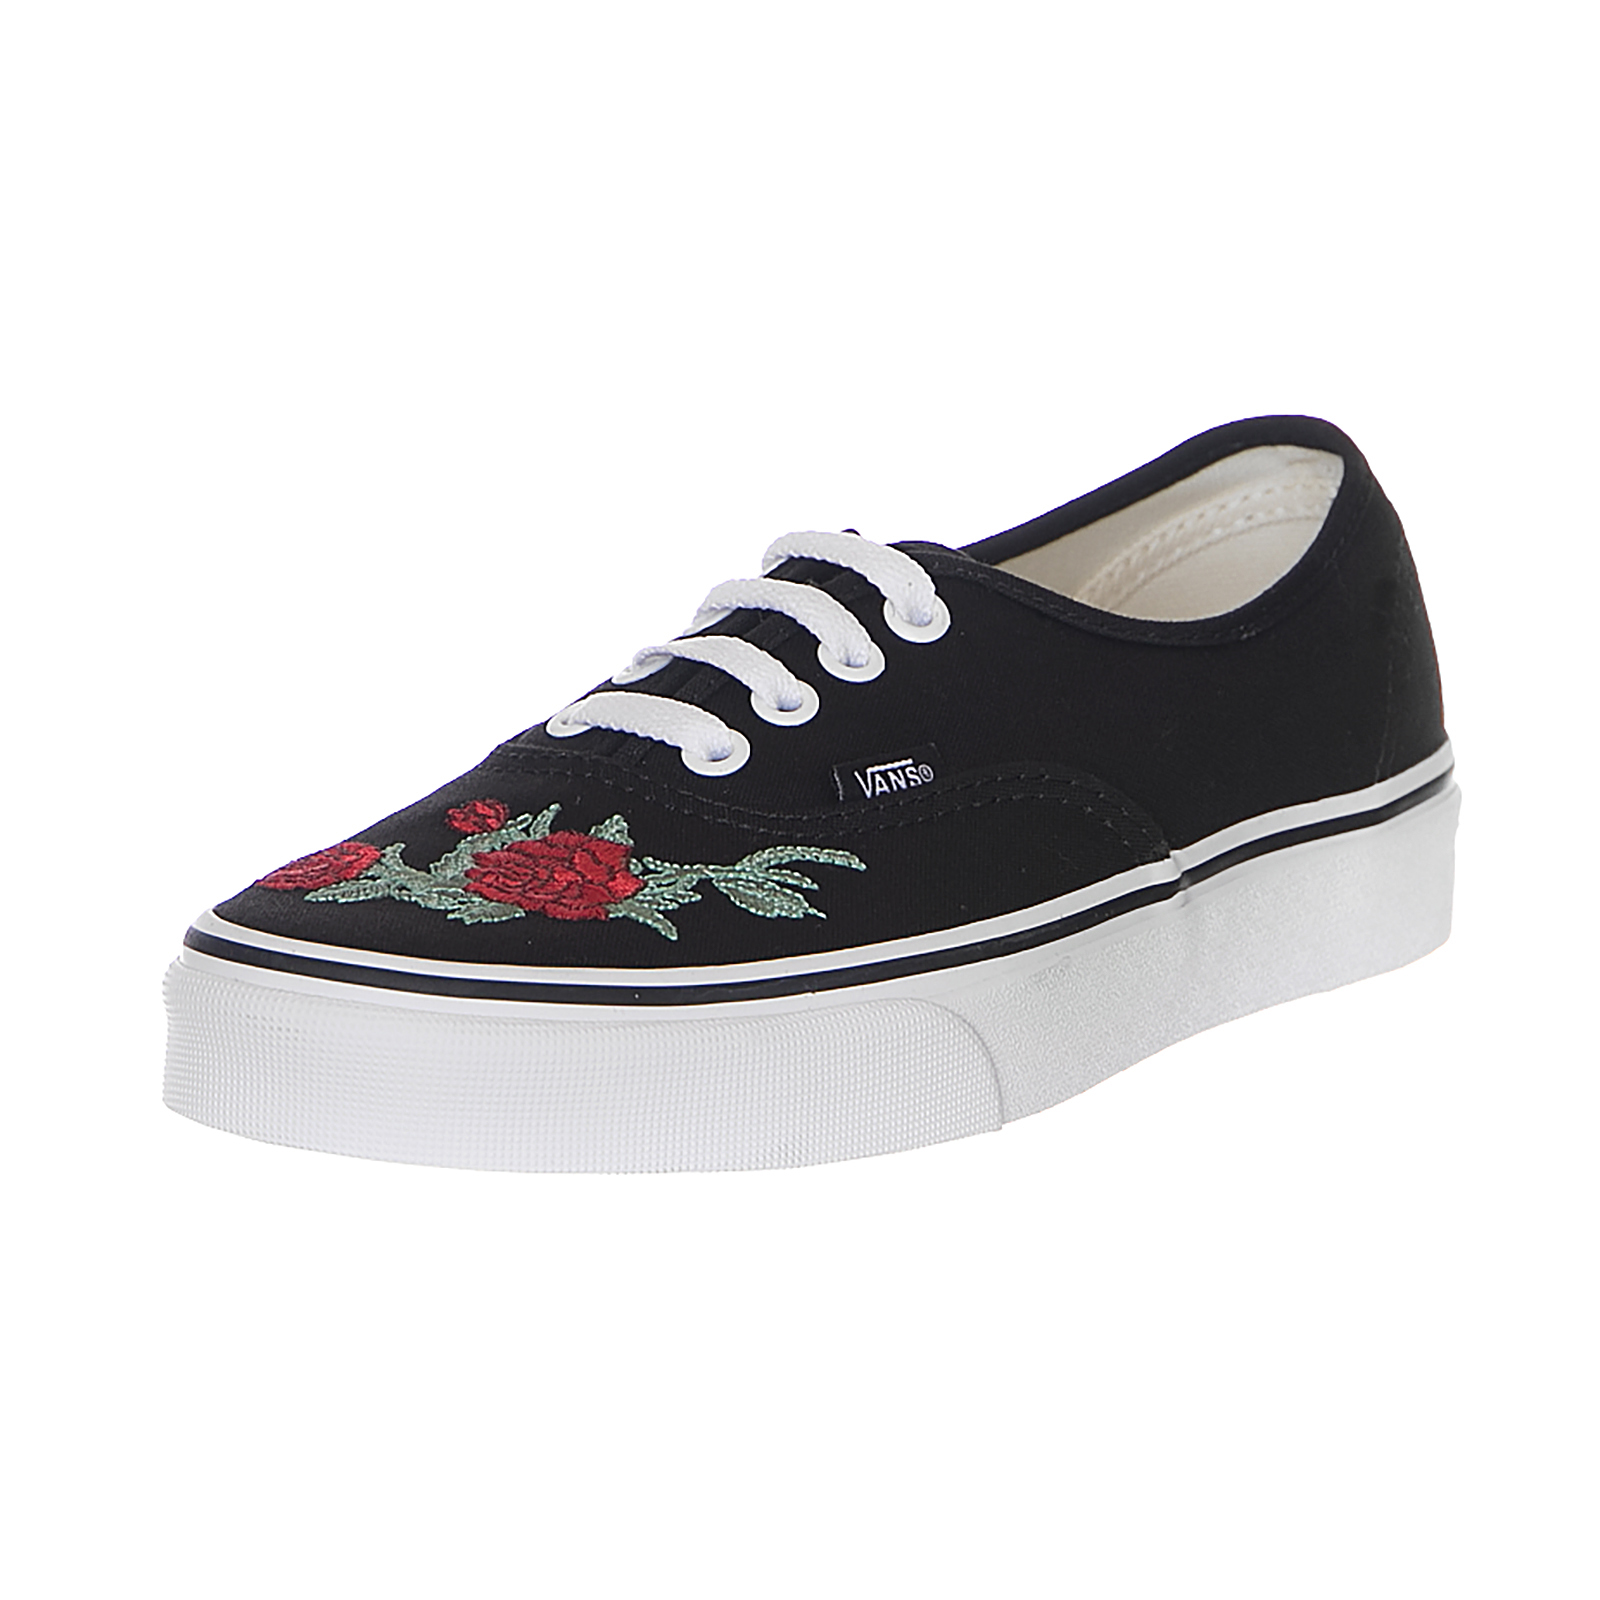 36f4d4a05337 Vans Sneakers Original Rose Thorns Red True Red True Red True White Black